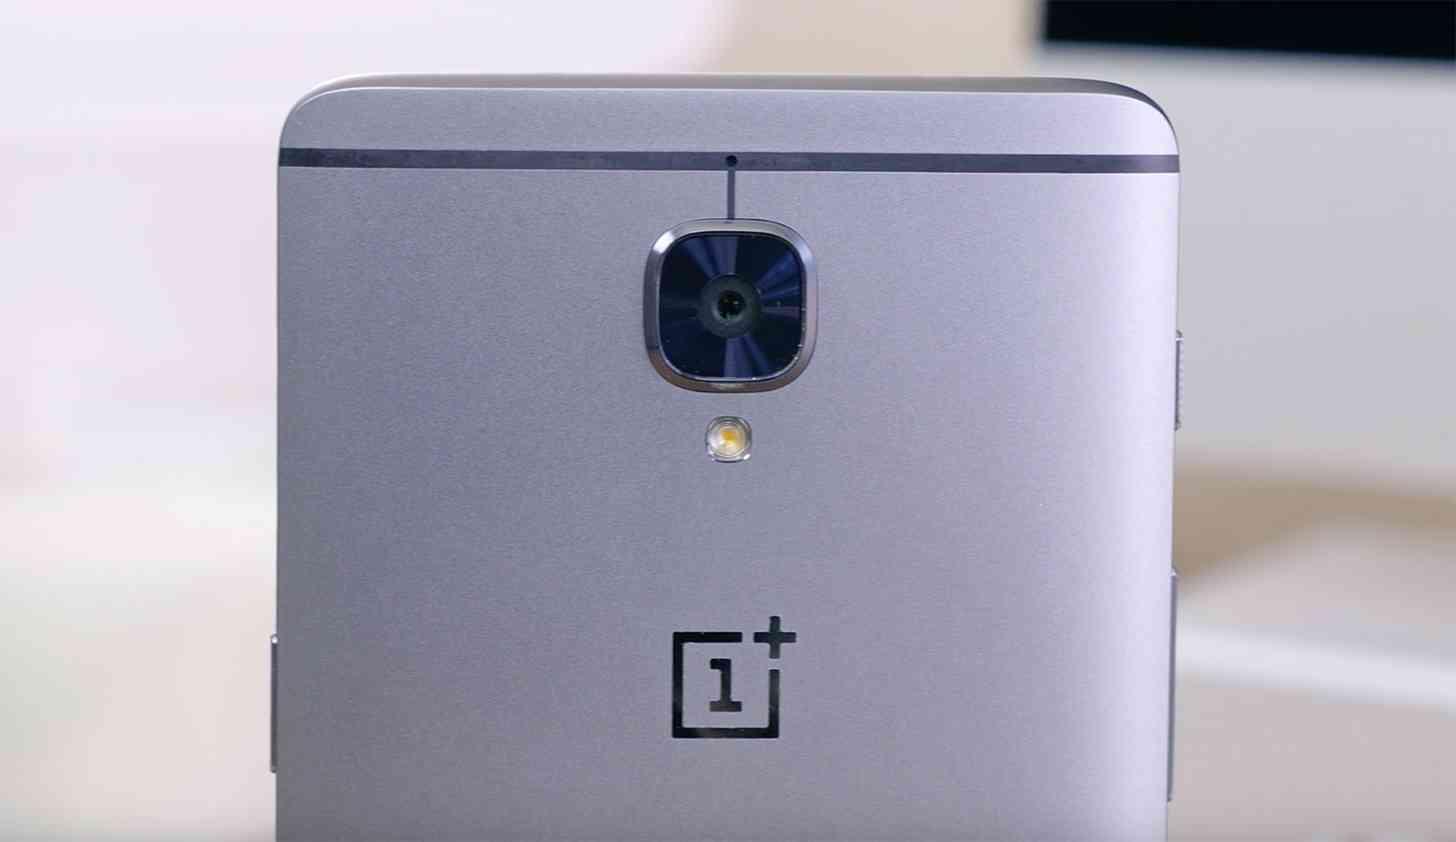 OnePlus 3 rear camera